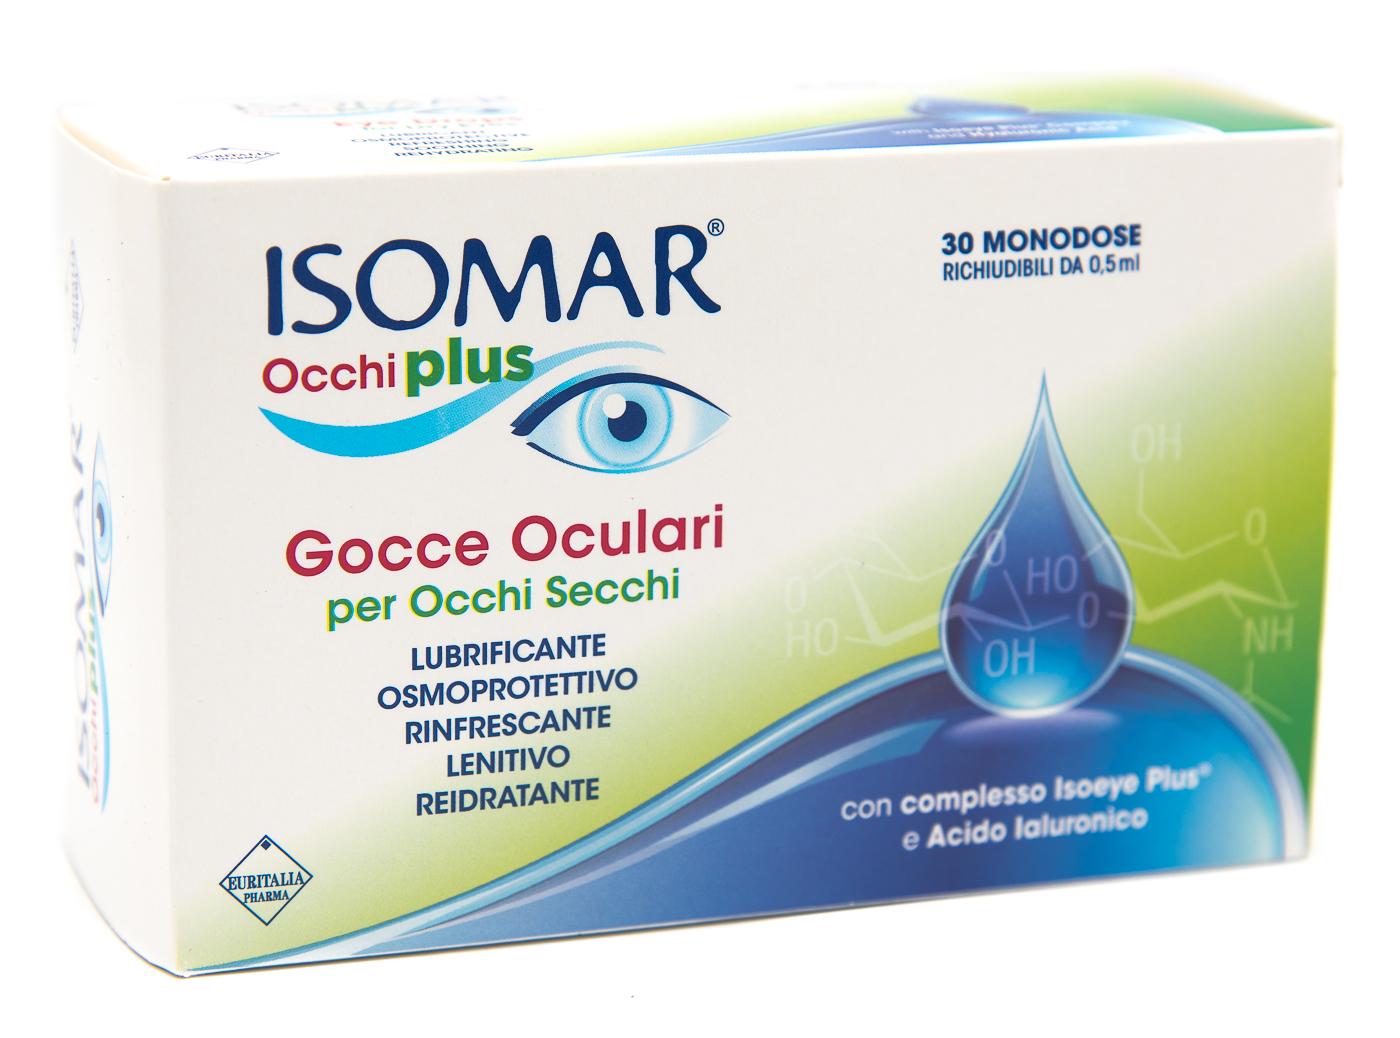 EURITALIA PHARMA (div.CoSWELL) Isomar Occhi Plus Gocce Oculari Monodose 30flx0.5ml